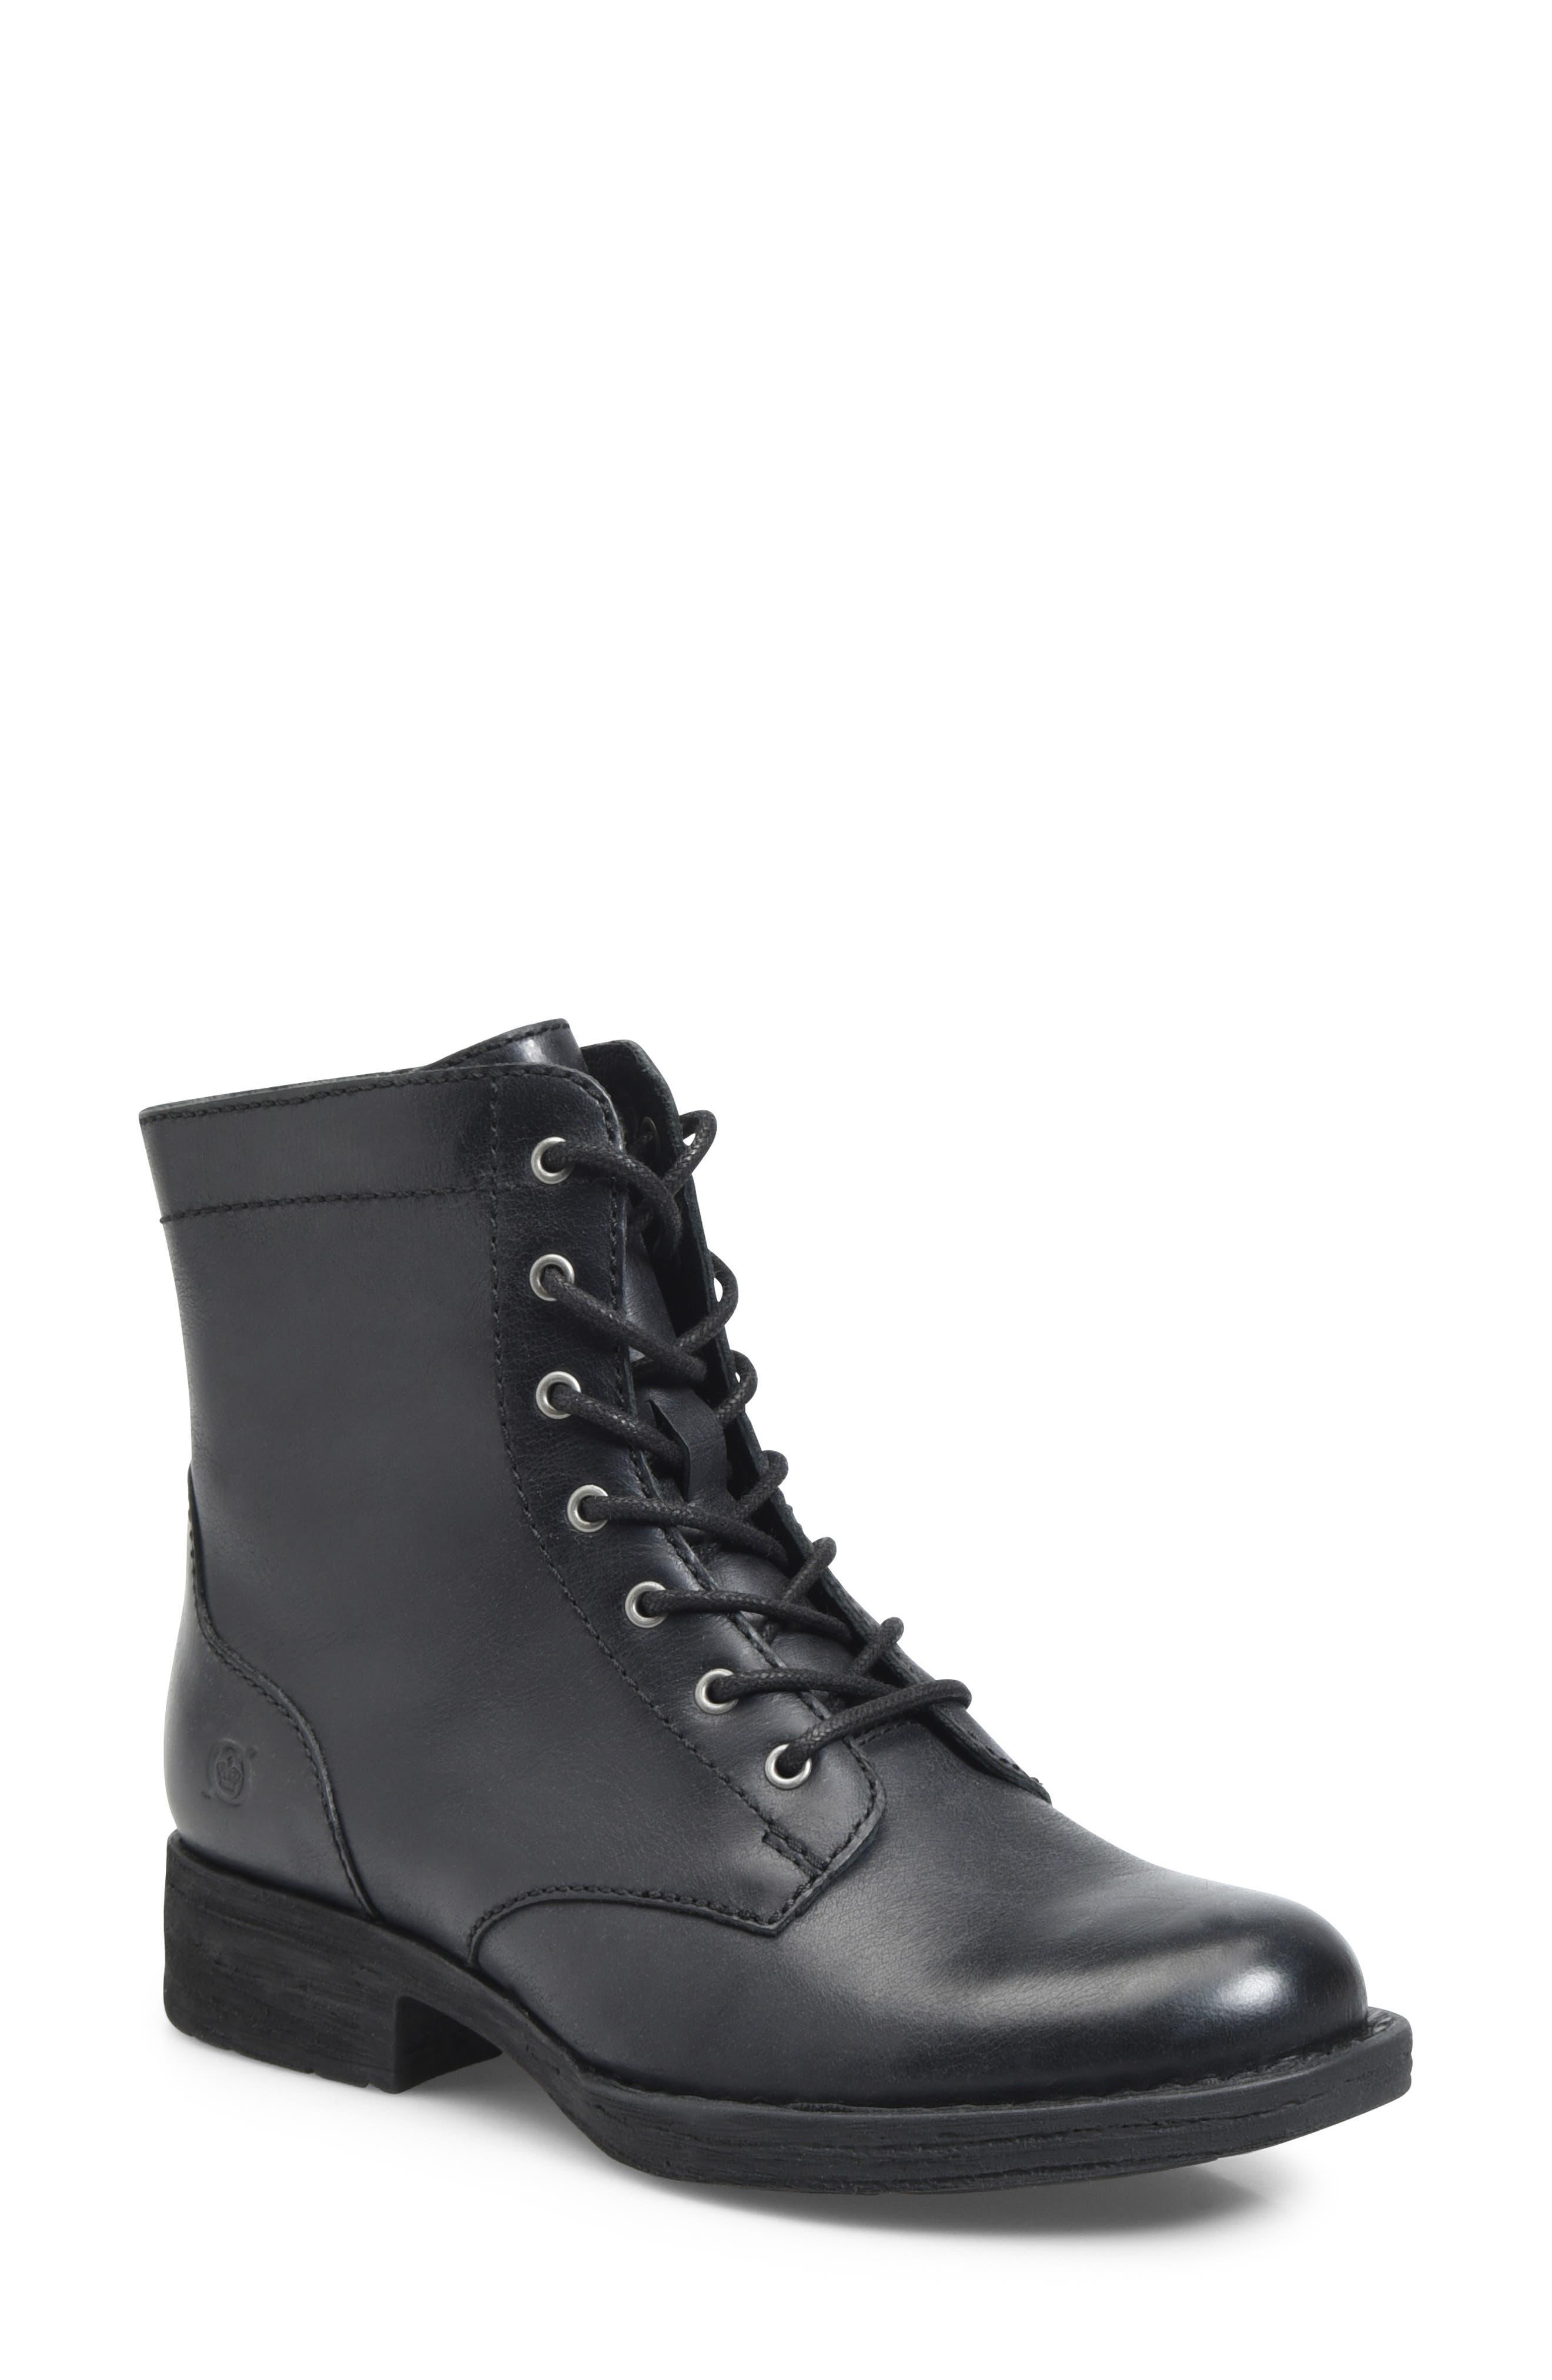 B?rn Evans Boot, Black